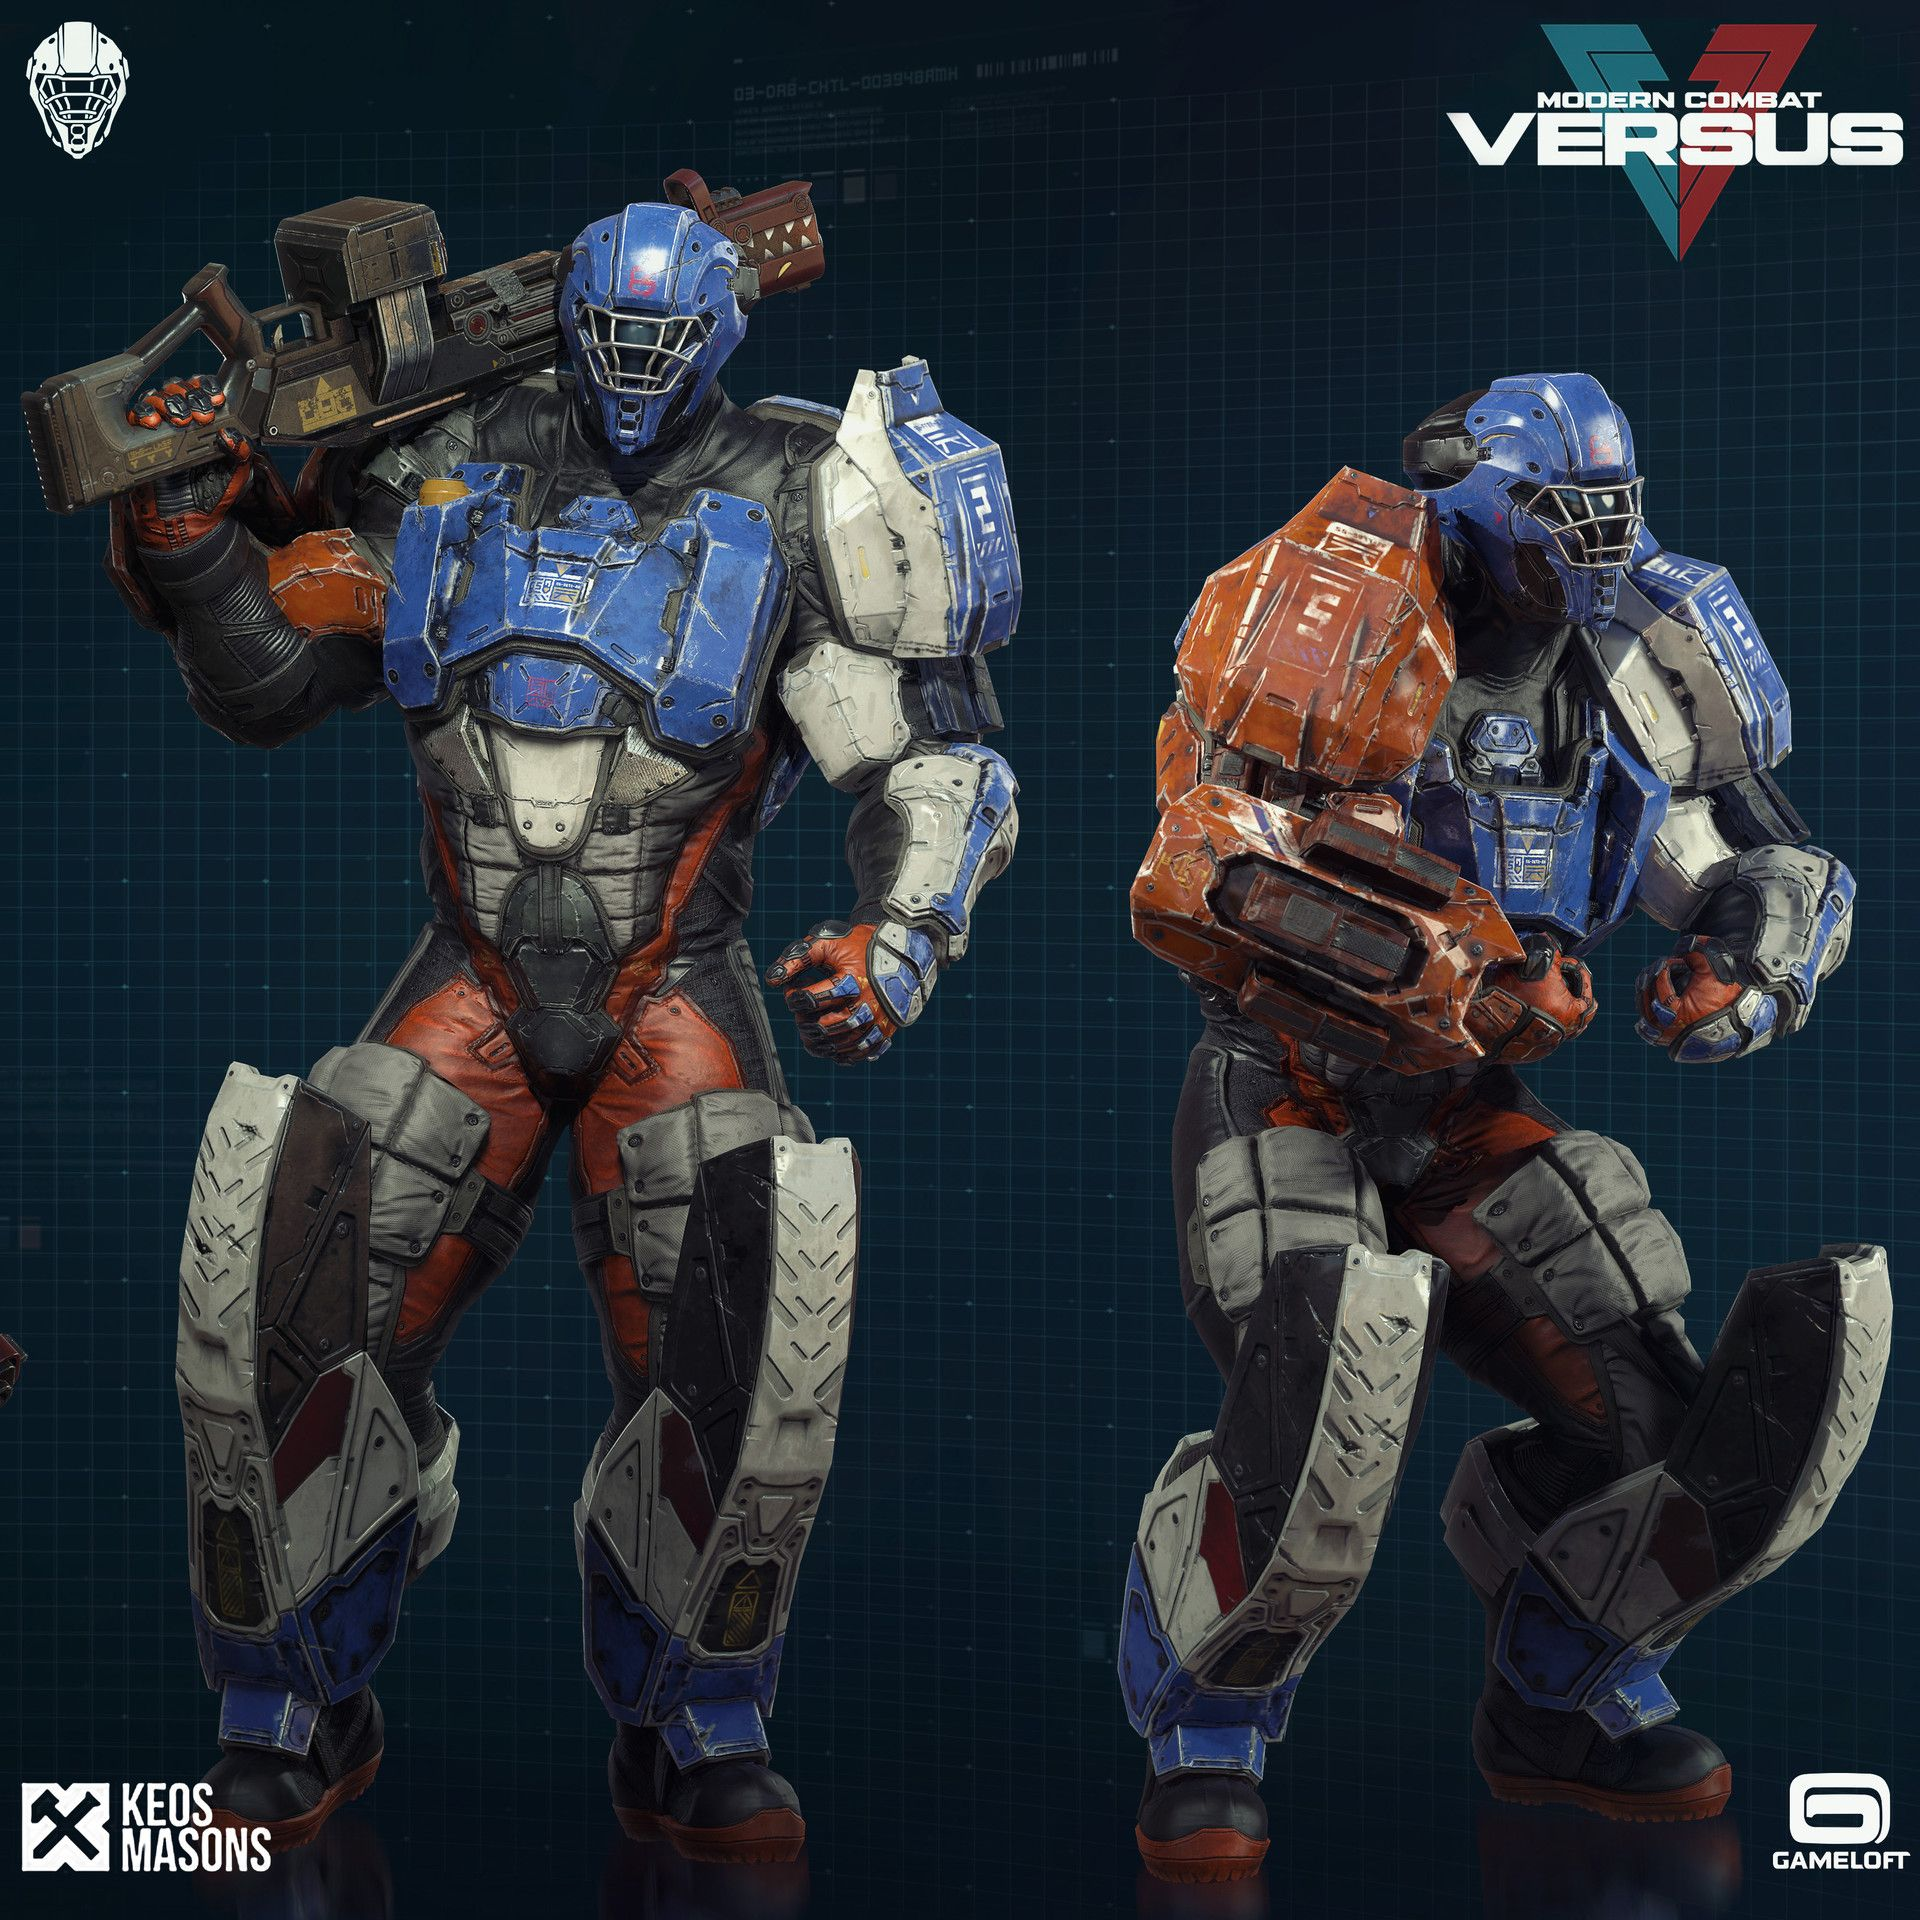 ArtStation - Modern Combat Versus New Character - Gameloft, KEOS ...